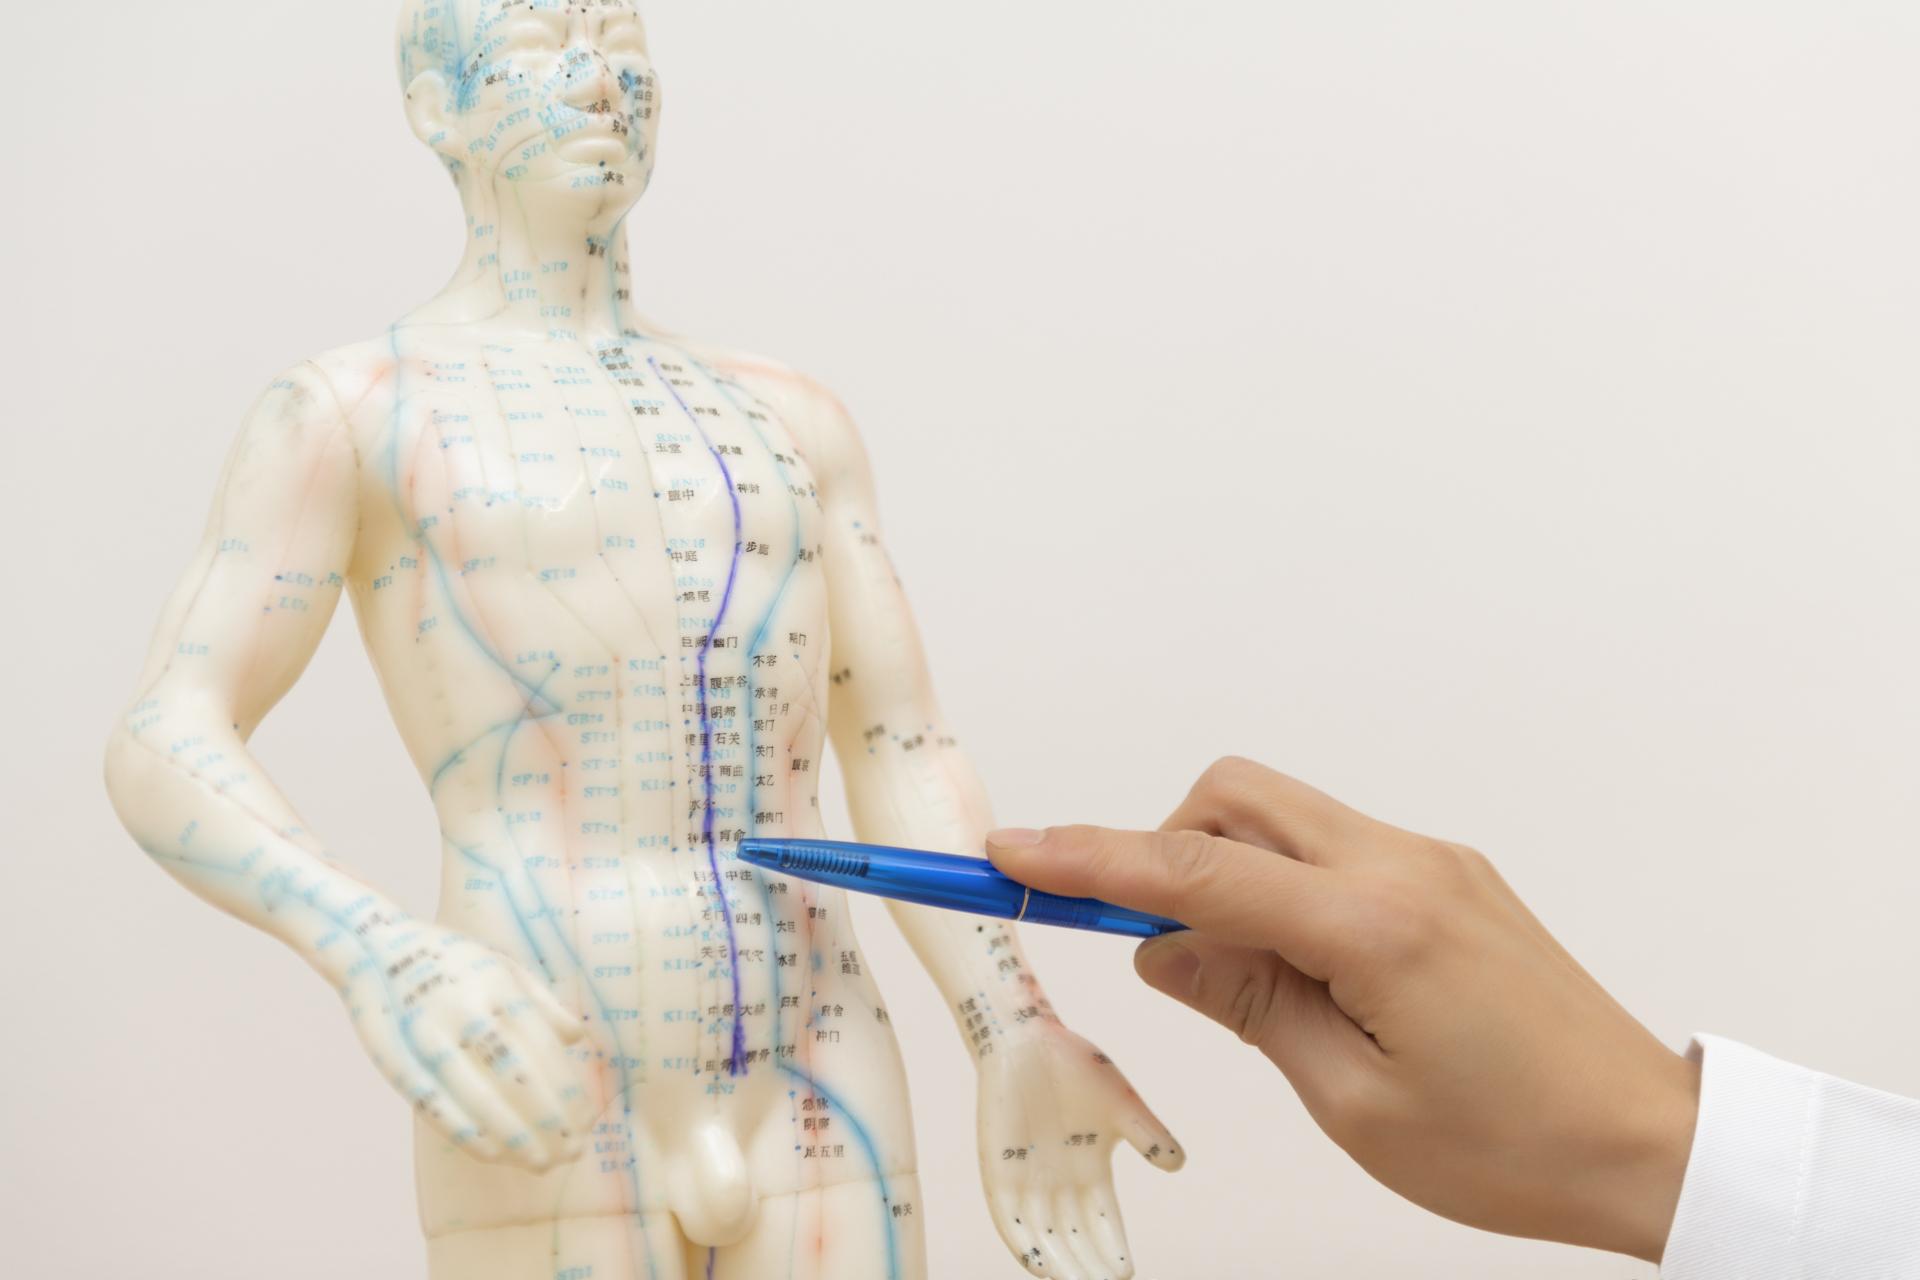 Dr-Di-Chen-Koenig-TCM-Akupunktur-Mensch